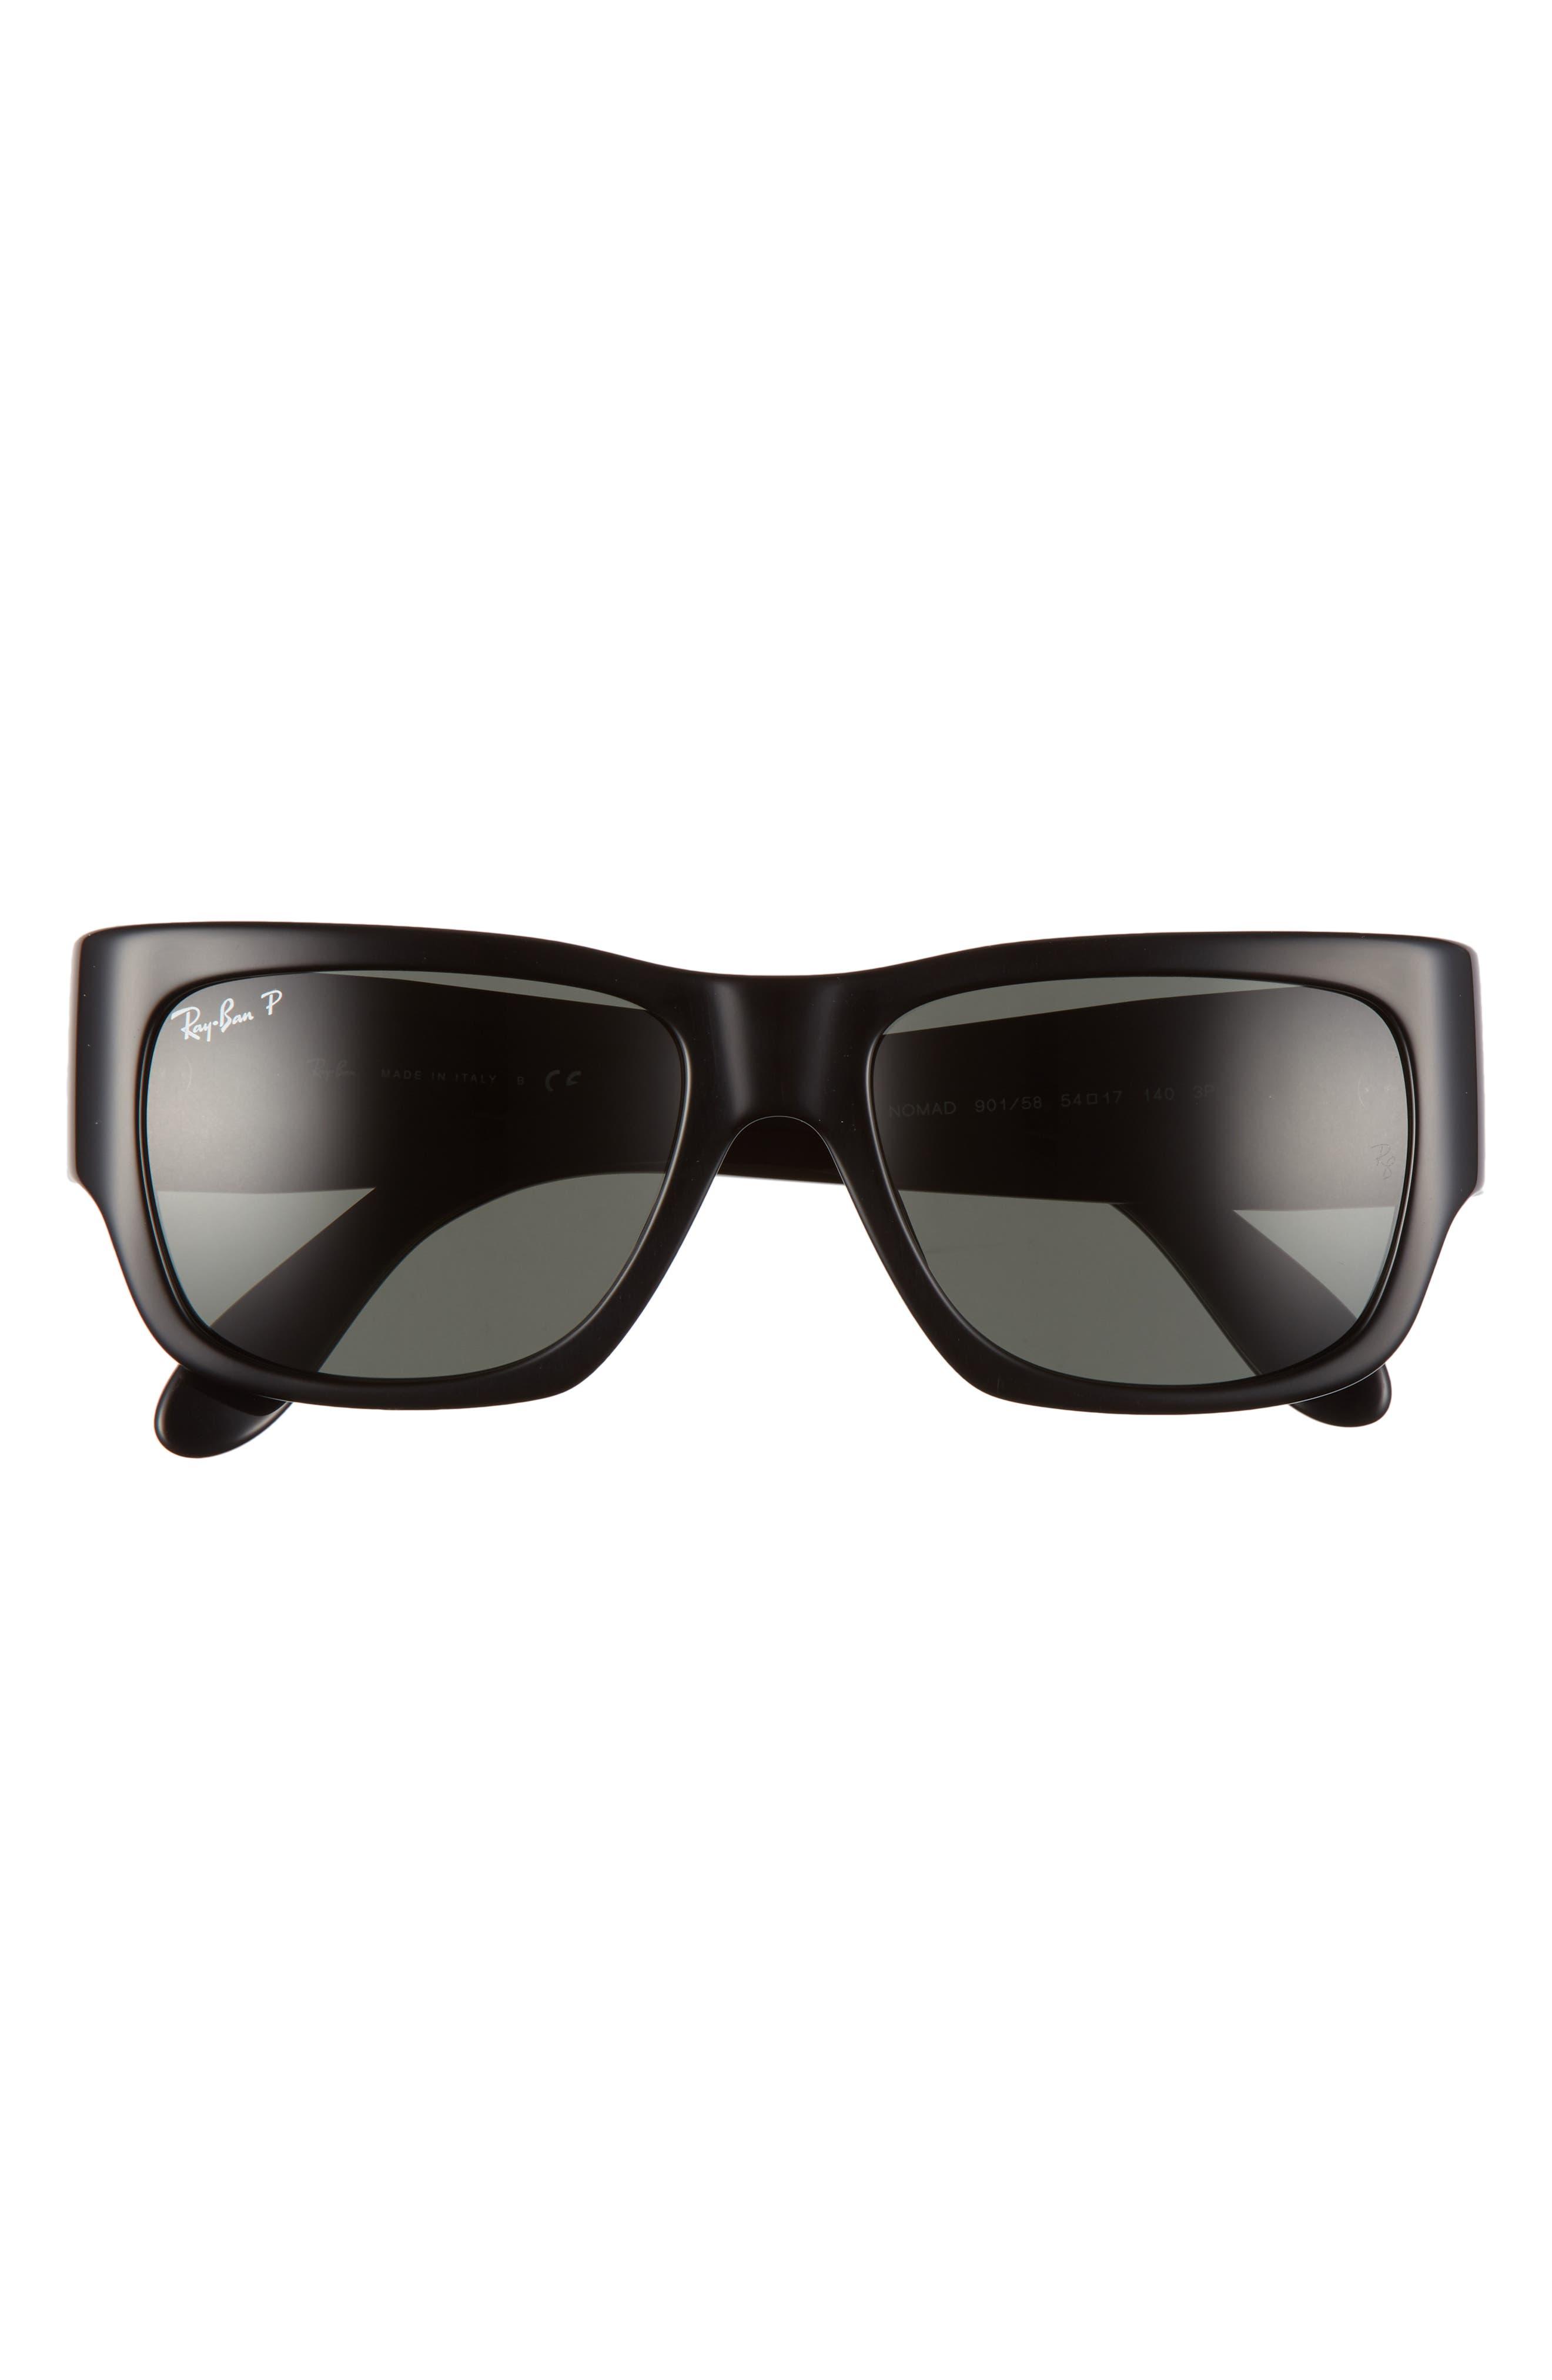 Ray Ban 54mm Polarized Wayfarer Sunglasses In Shiny Black/ Green